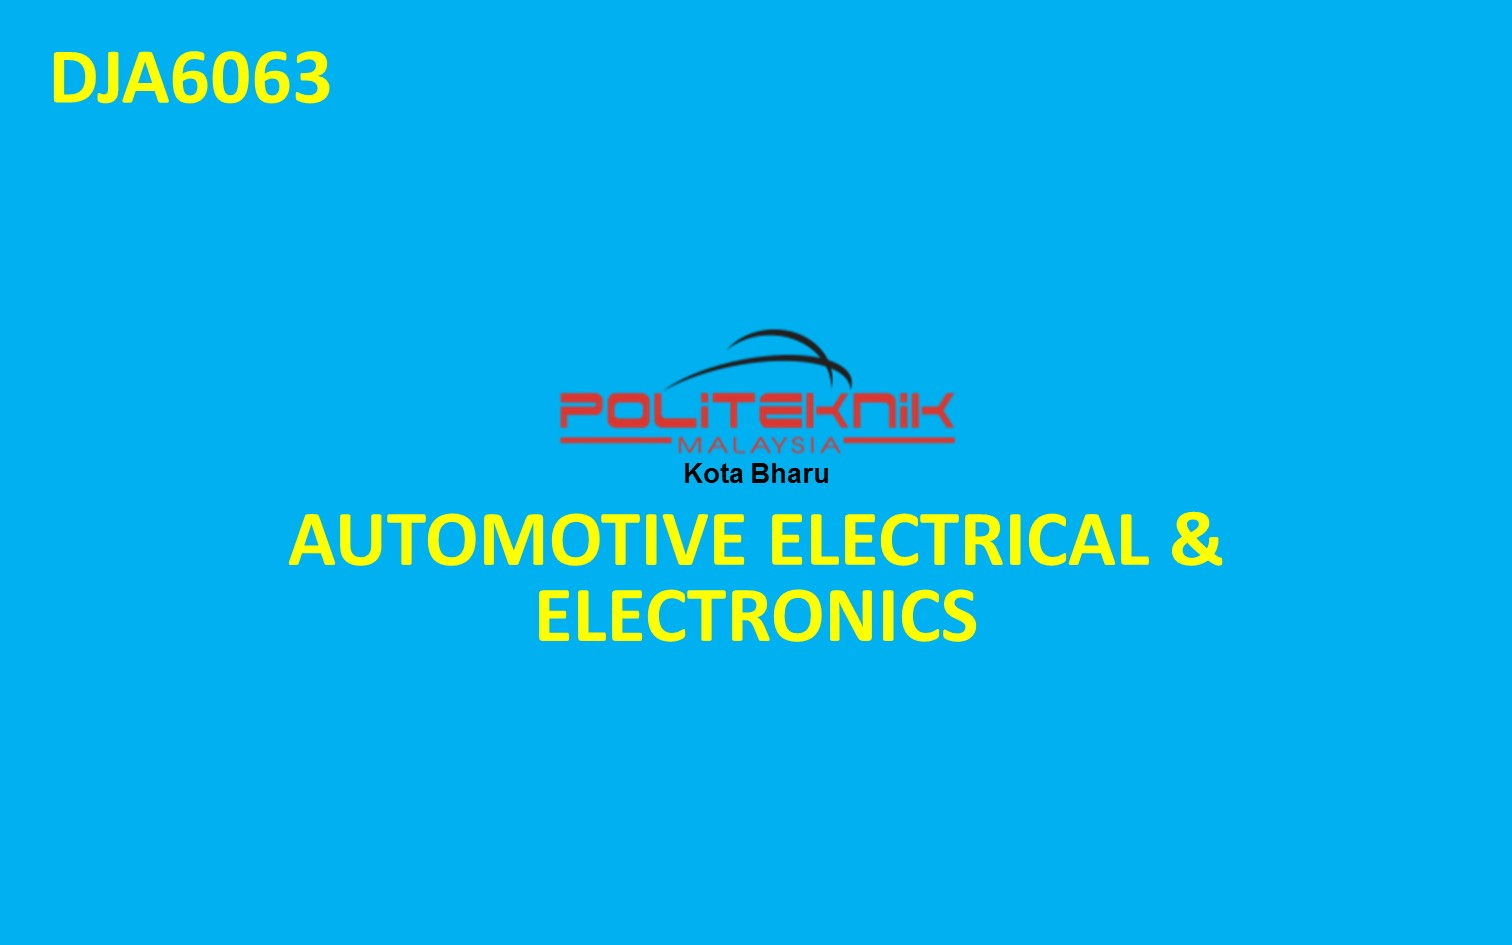 DJA6063 AUTOMOTIVE ELECTRICAL AND ELECTRONICS